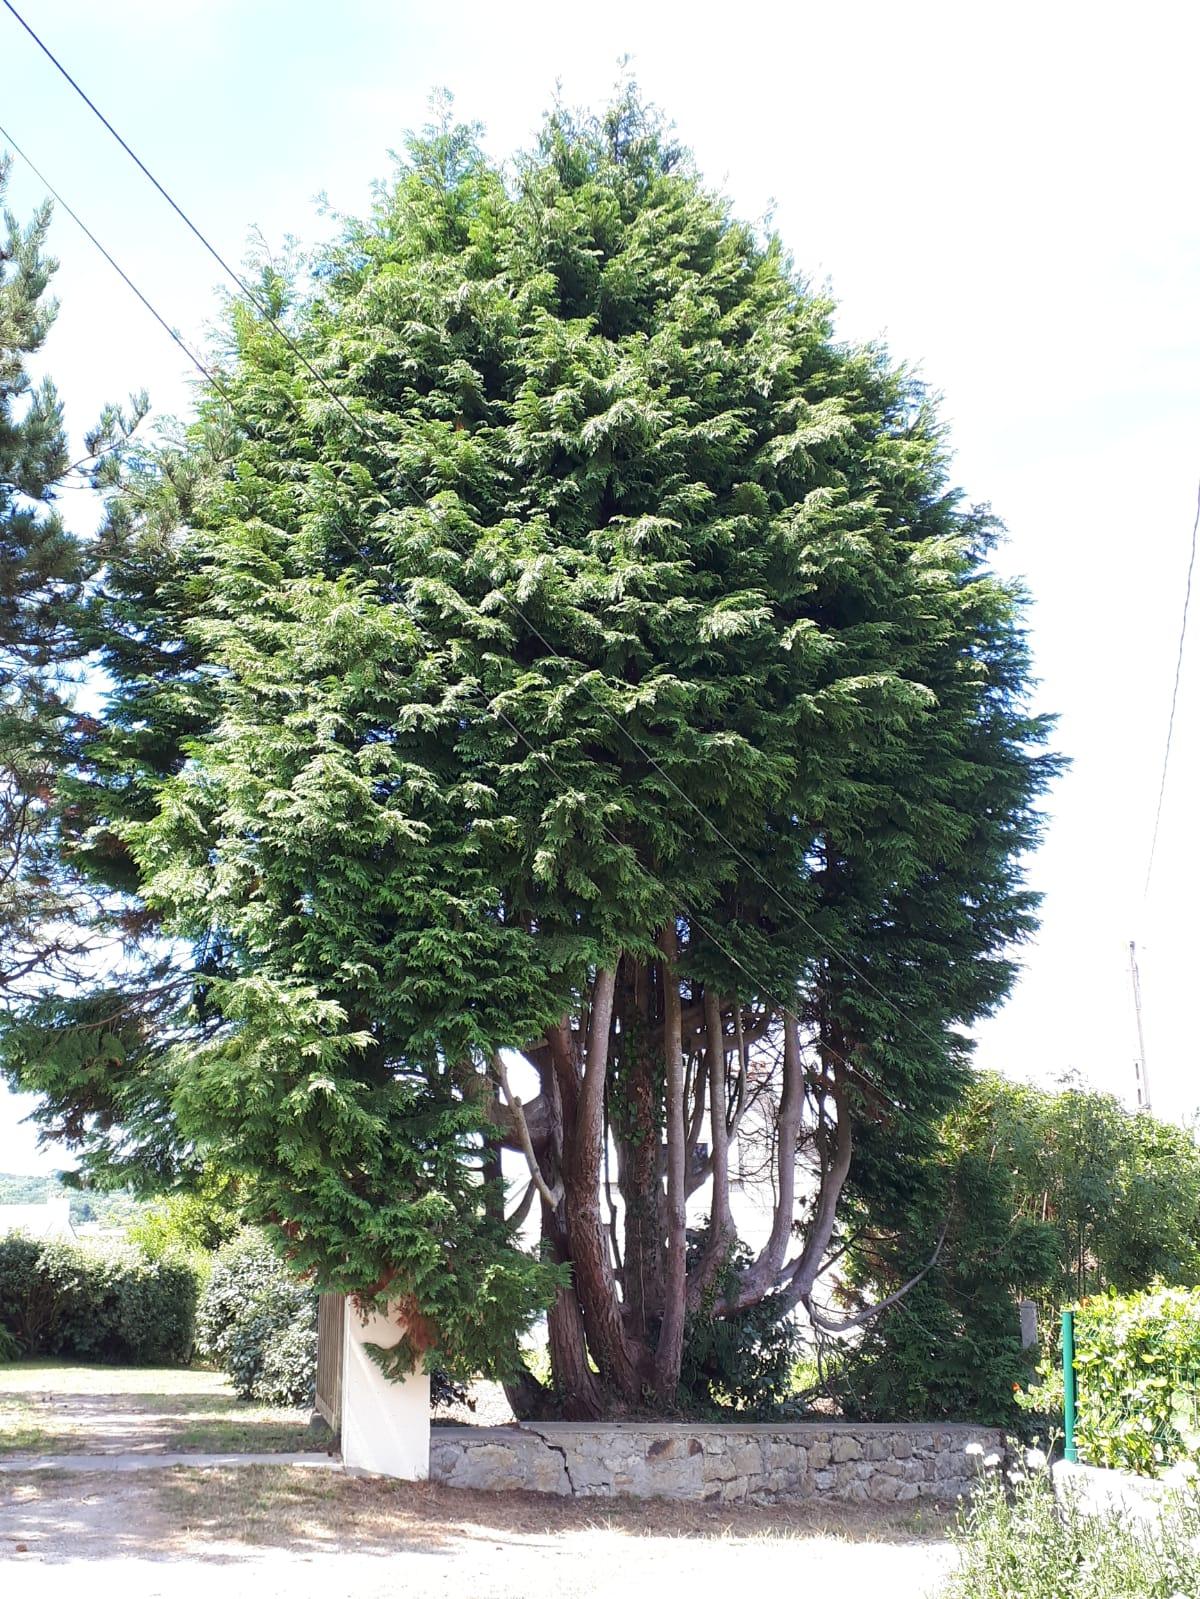 L'arbre curieux